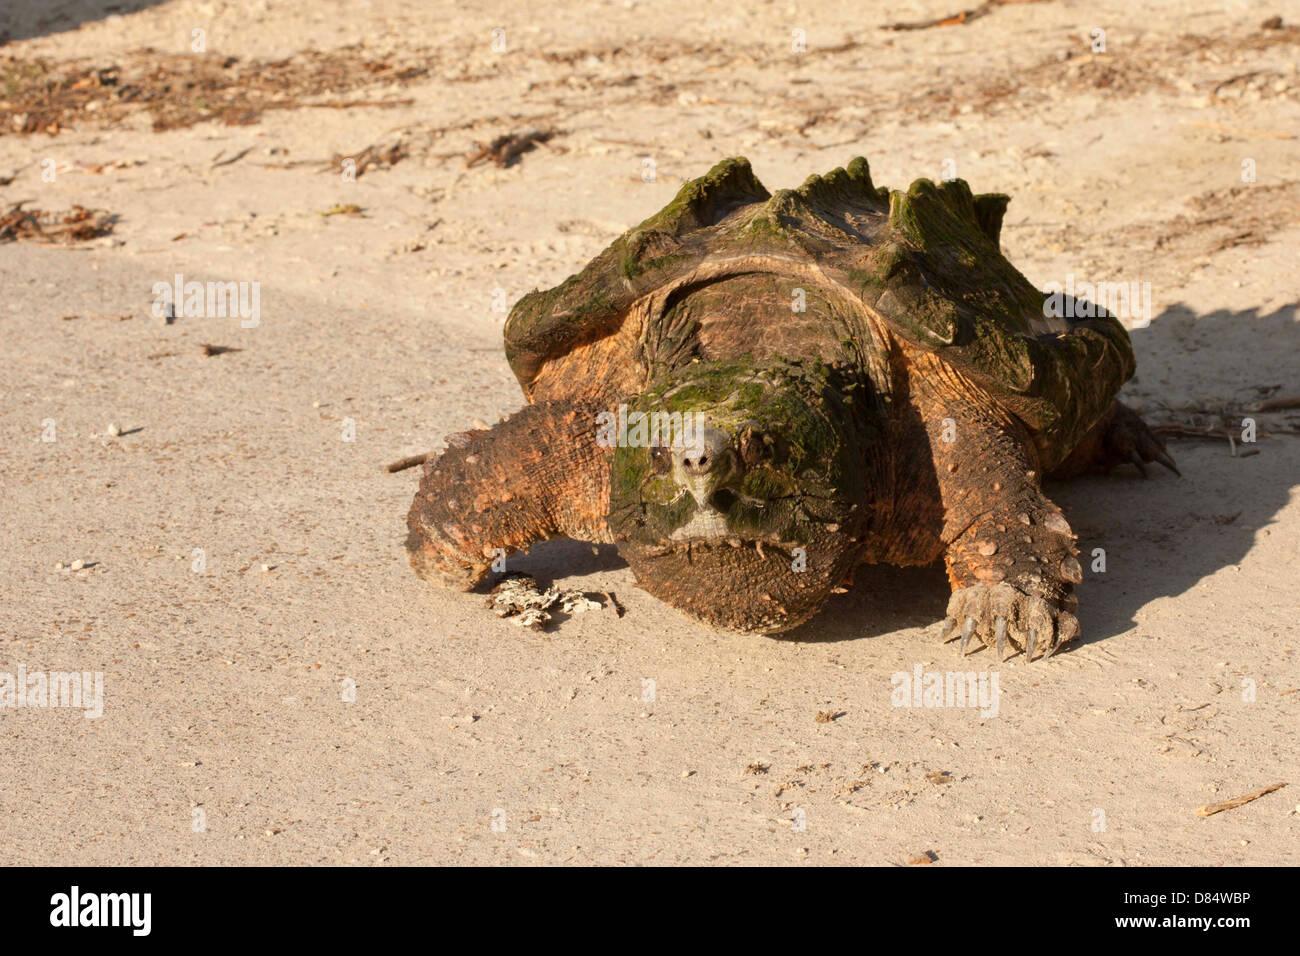 Alligator snapping turtle walking down a boat ramp - Macrochelys temminckii - Stock Image